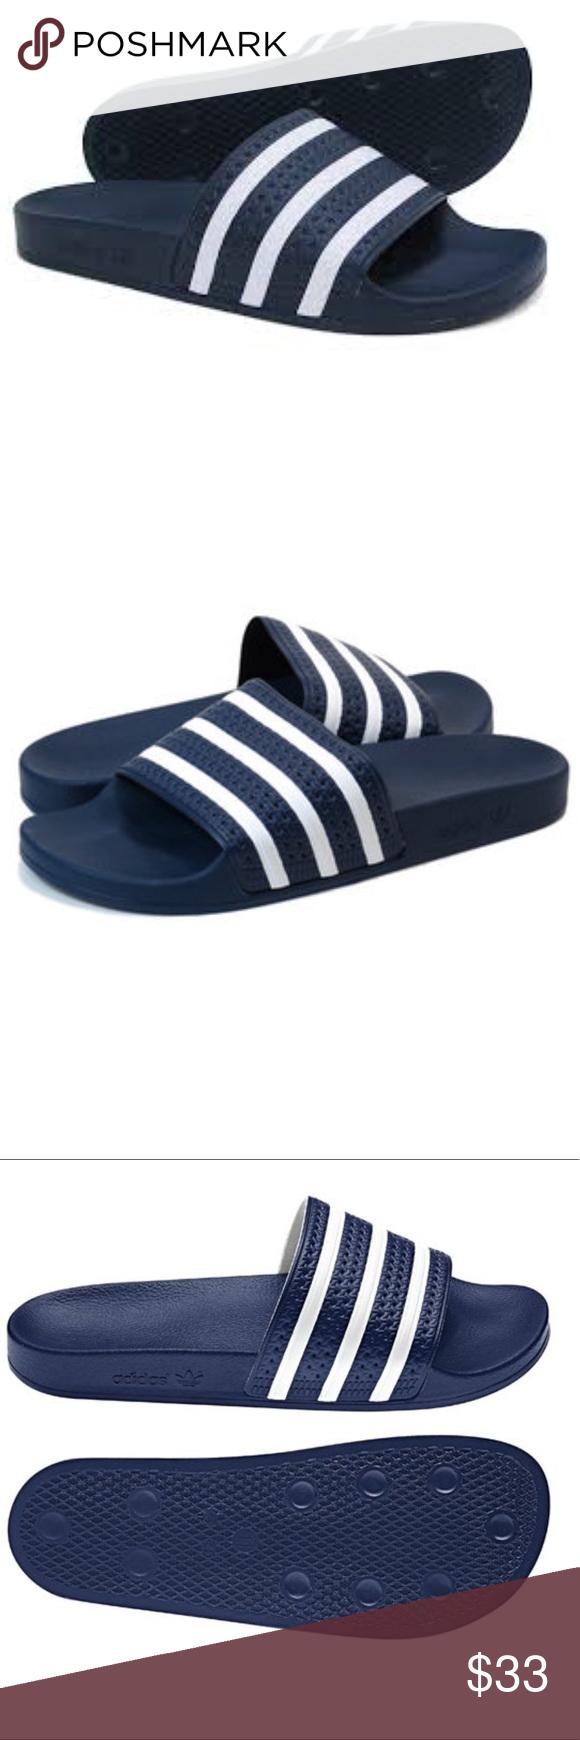 bnib adidas adilette diapositive marina bianchi piscina diapositive, adidas e